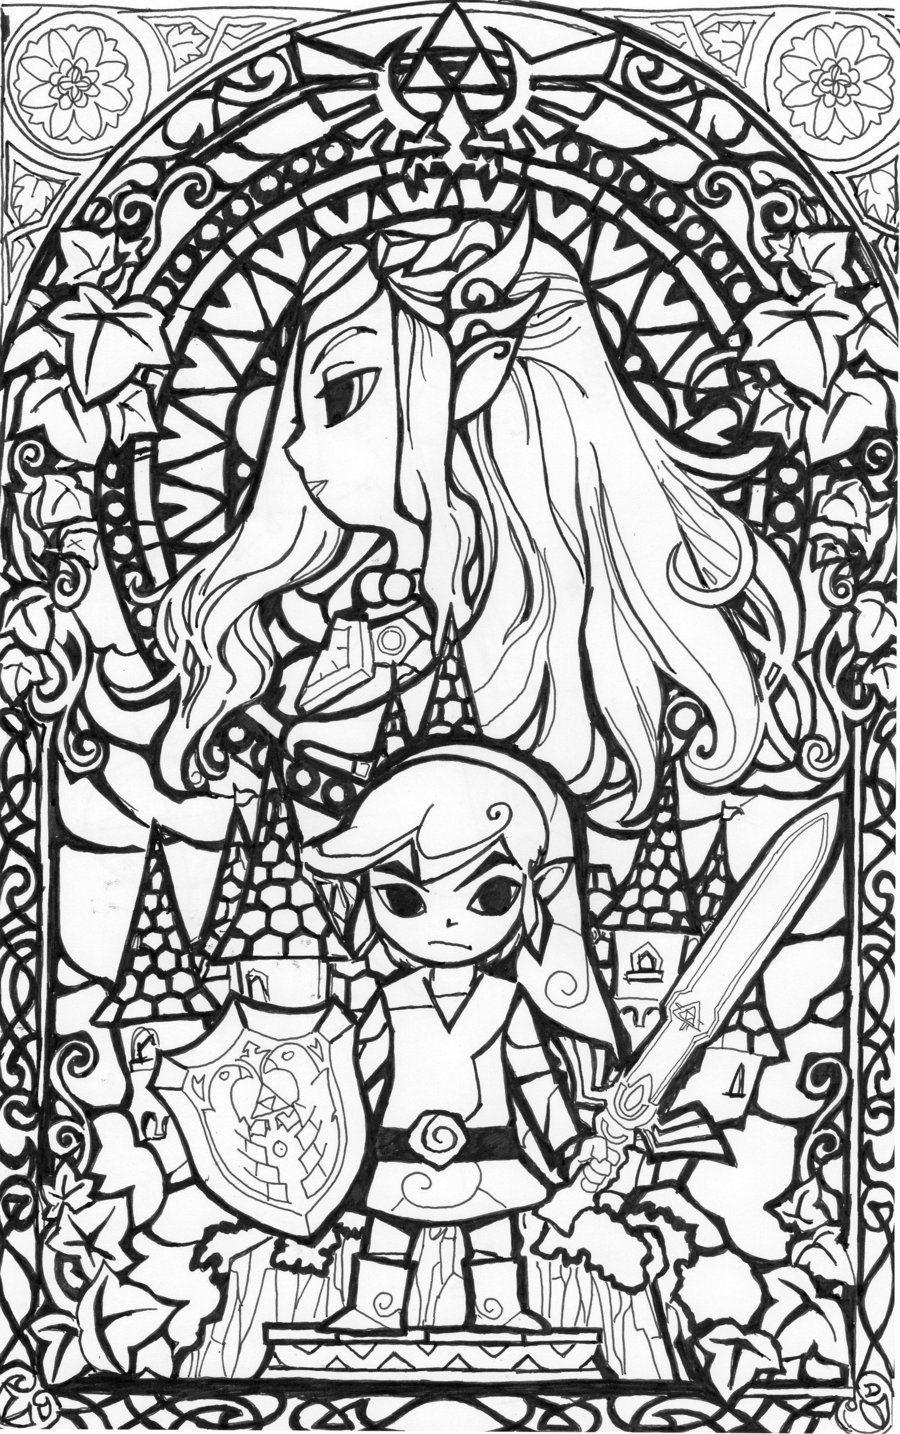 Coloring pages zelda - Coloring Pages Zelda Patagoipde